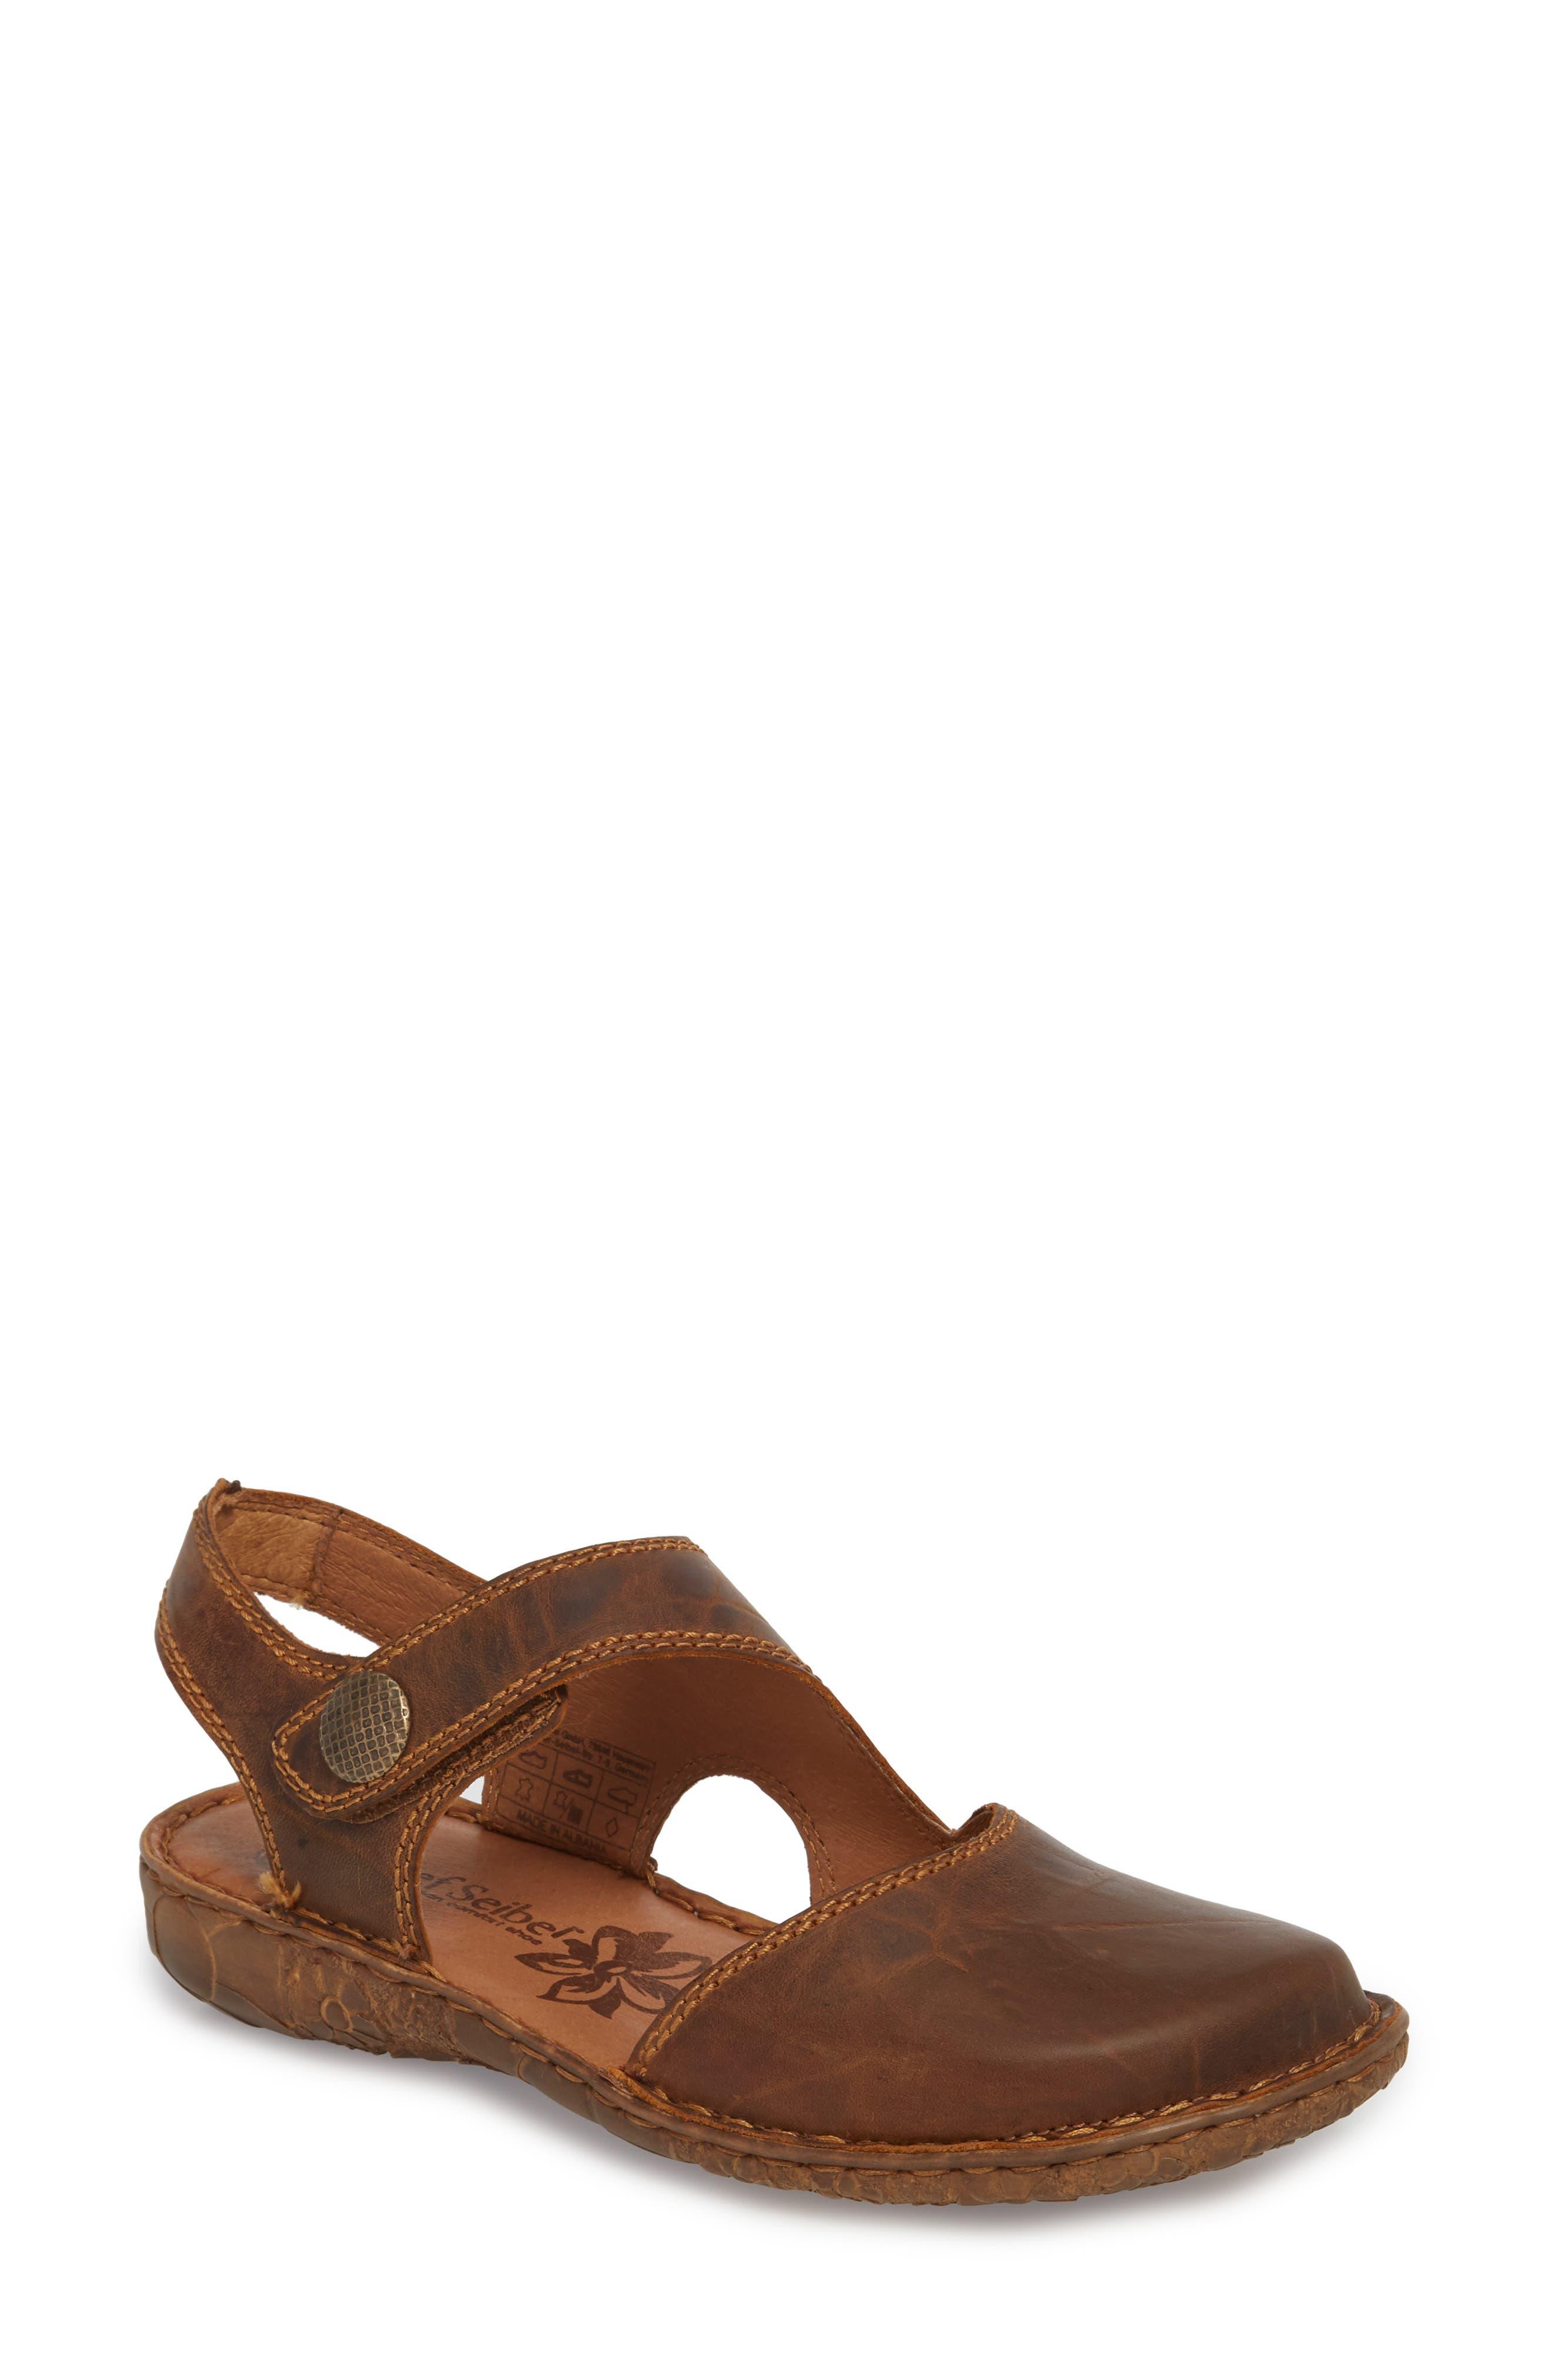 Rosalie 27 Sandal,                             Main thumbnail 1, color,                             Brandy Leather